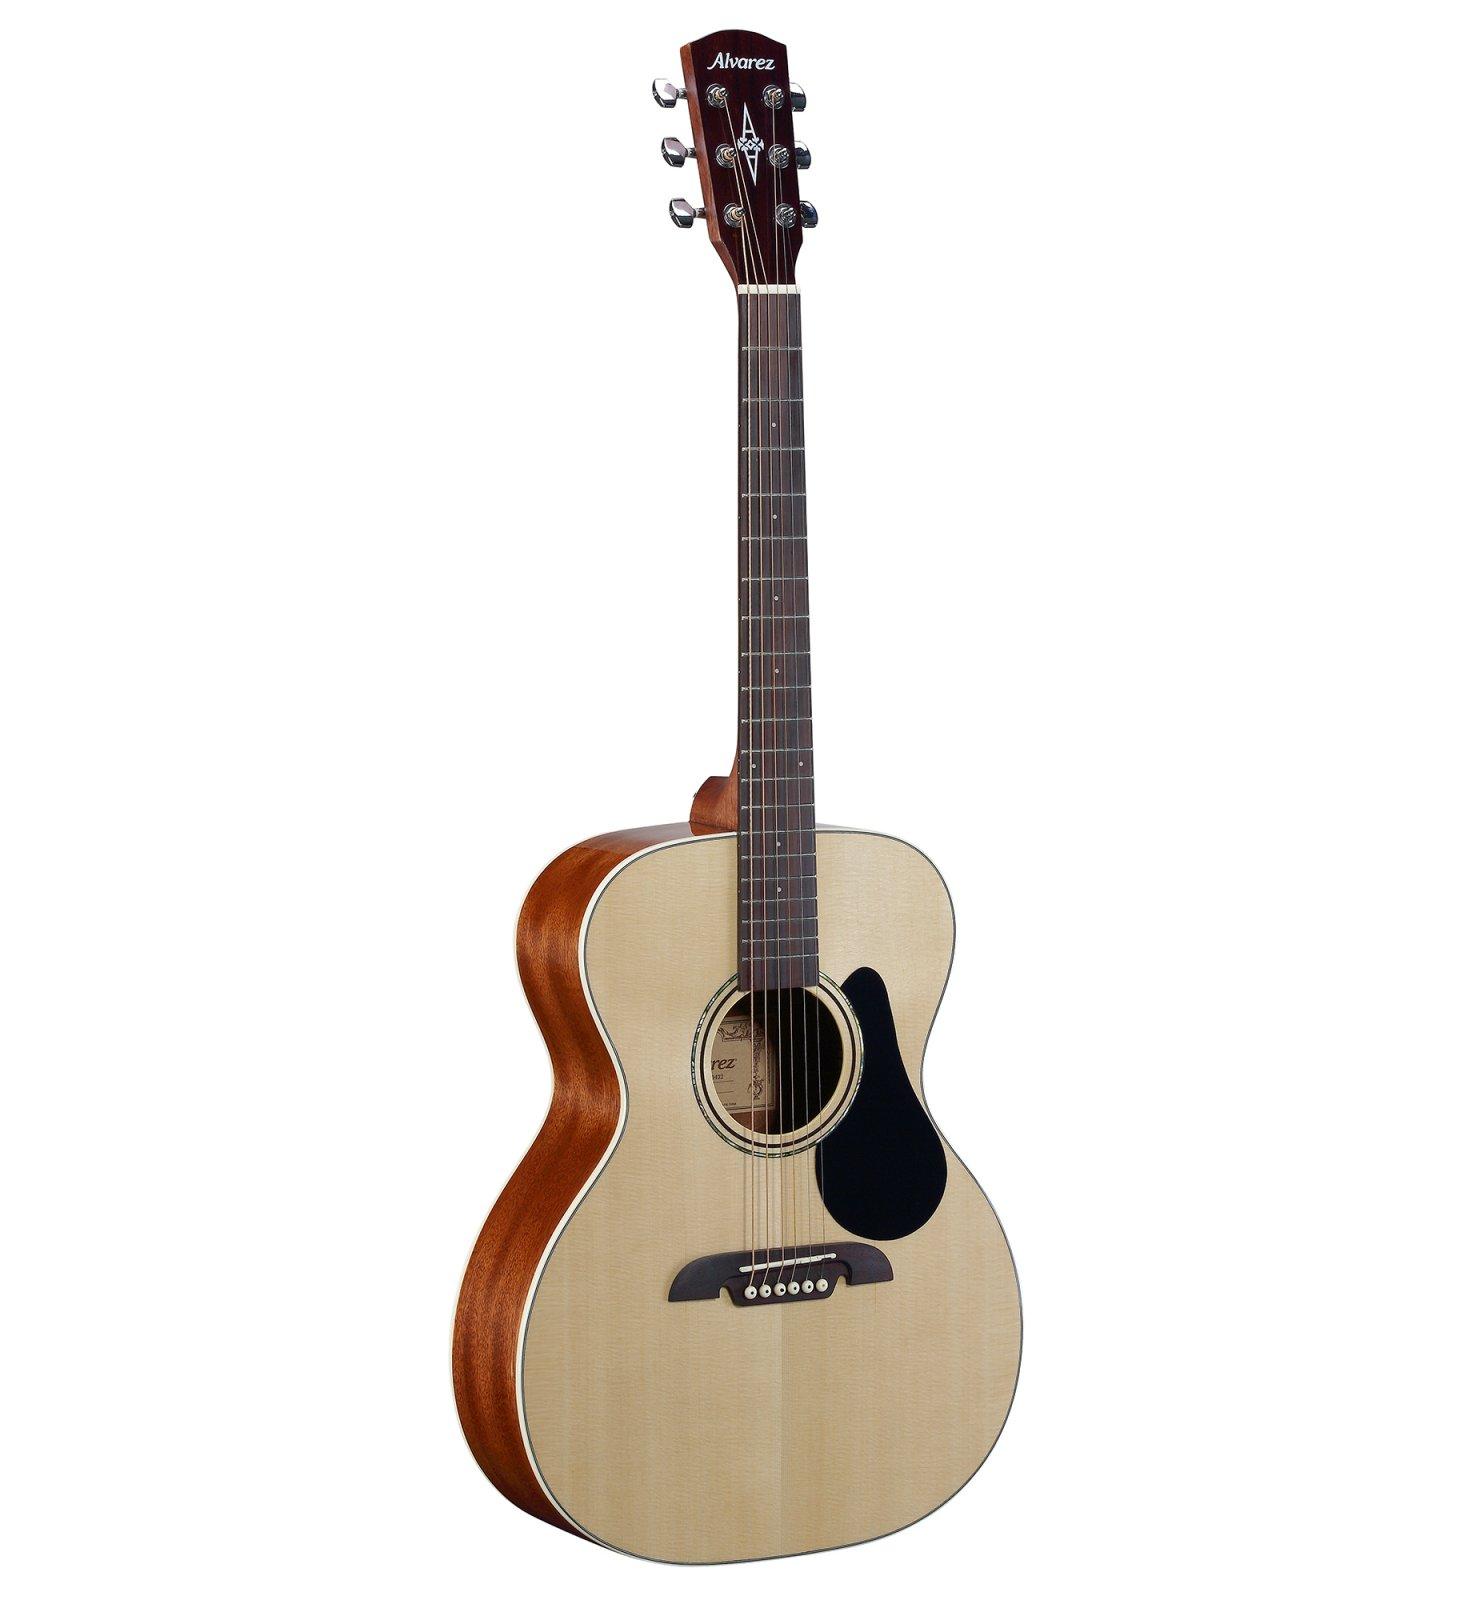 Alvarez RF26 OM/Folk Acoustic Guitar with Gigbag